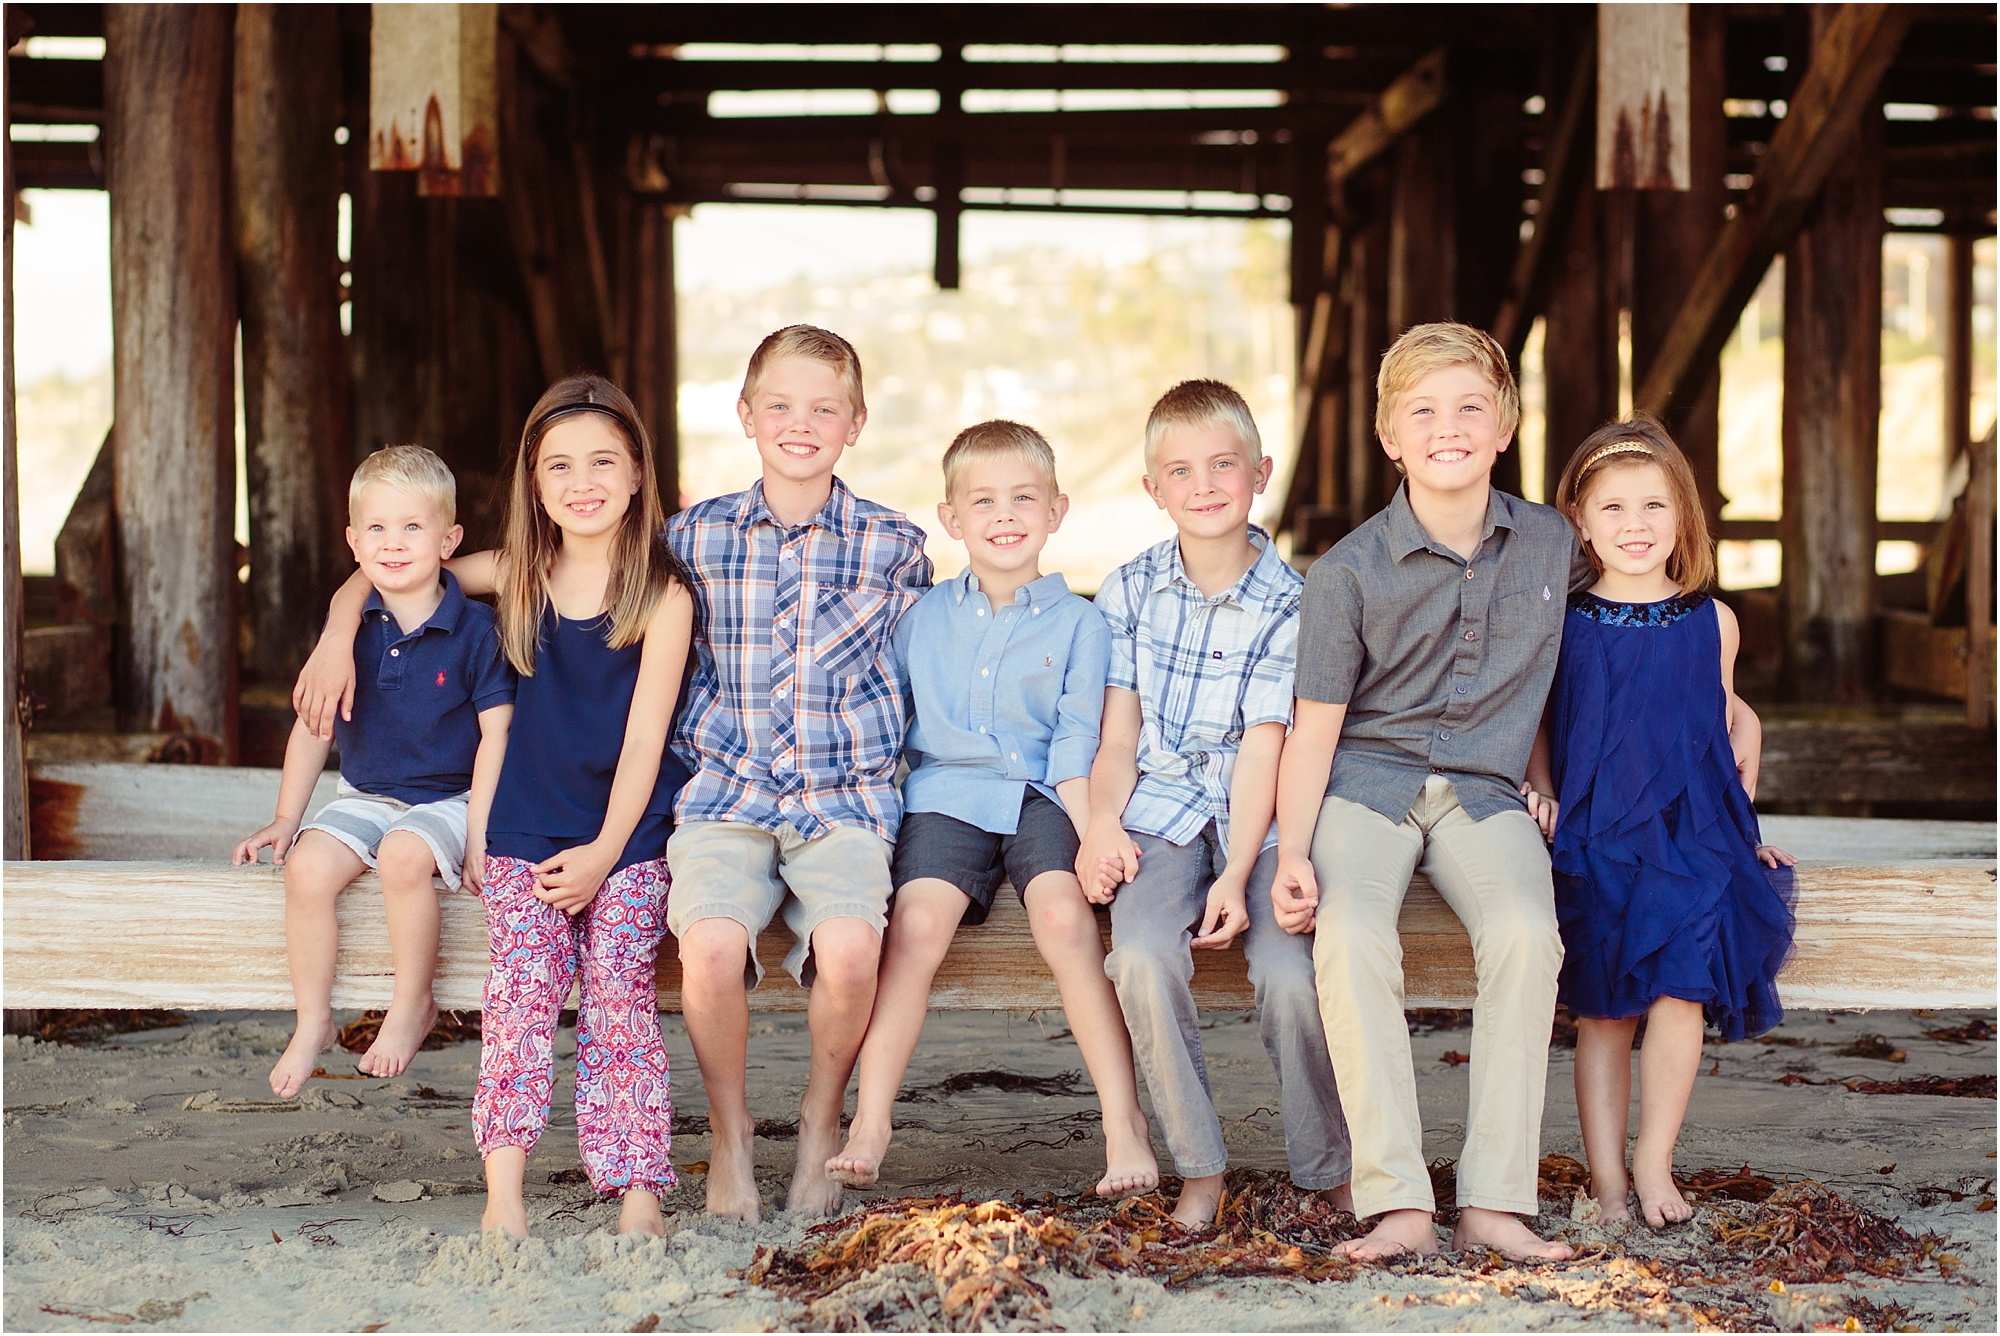 San Diego Family Photographer | Child Photography San Diego